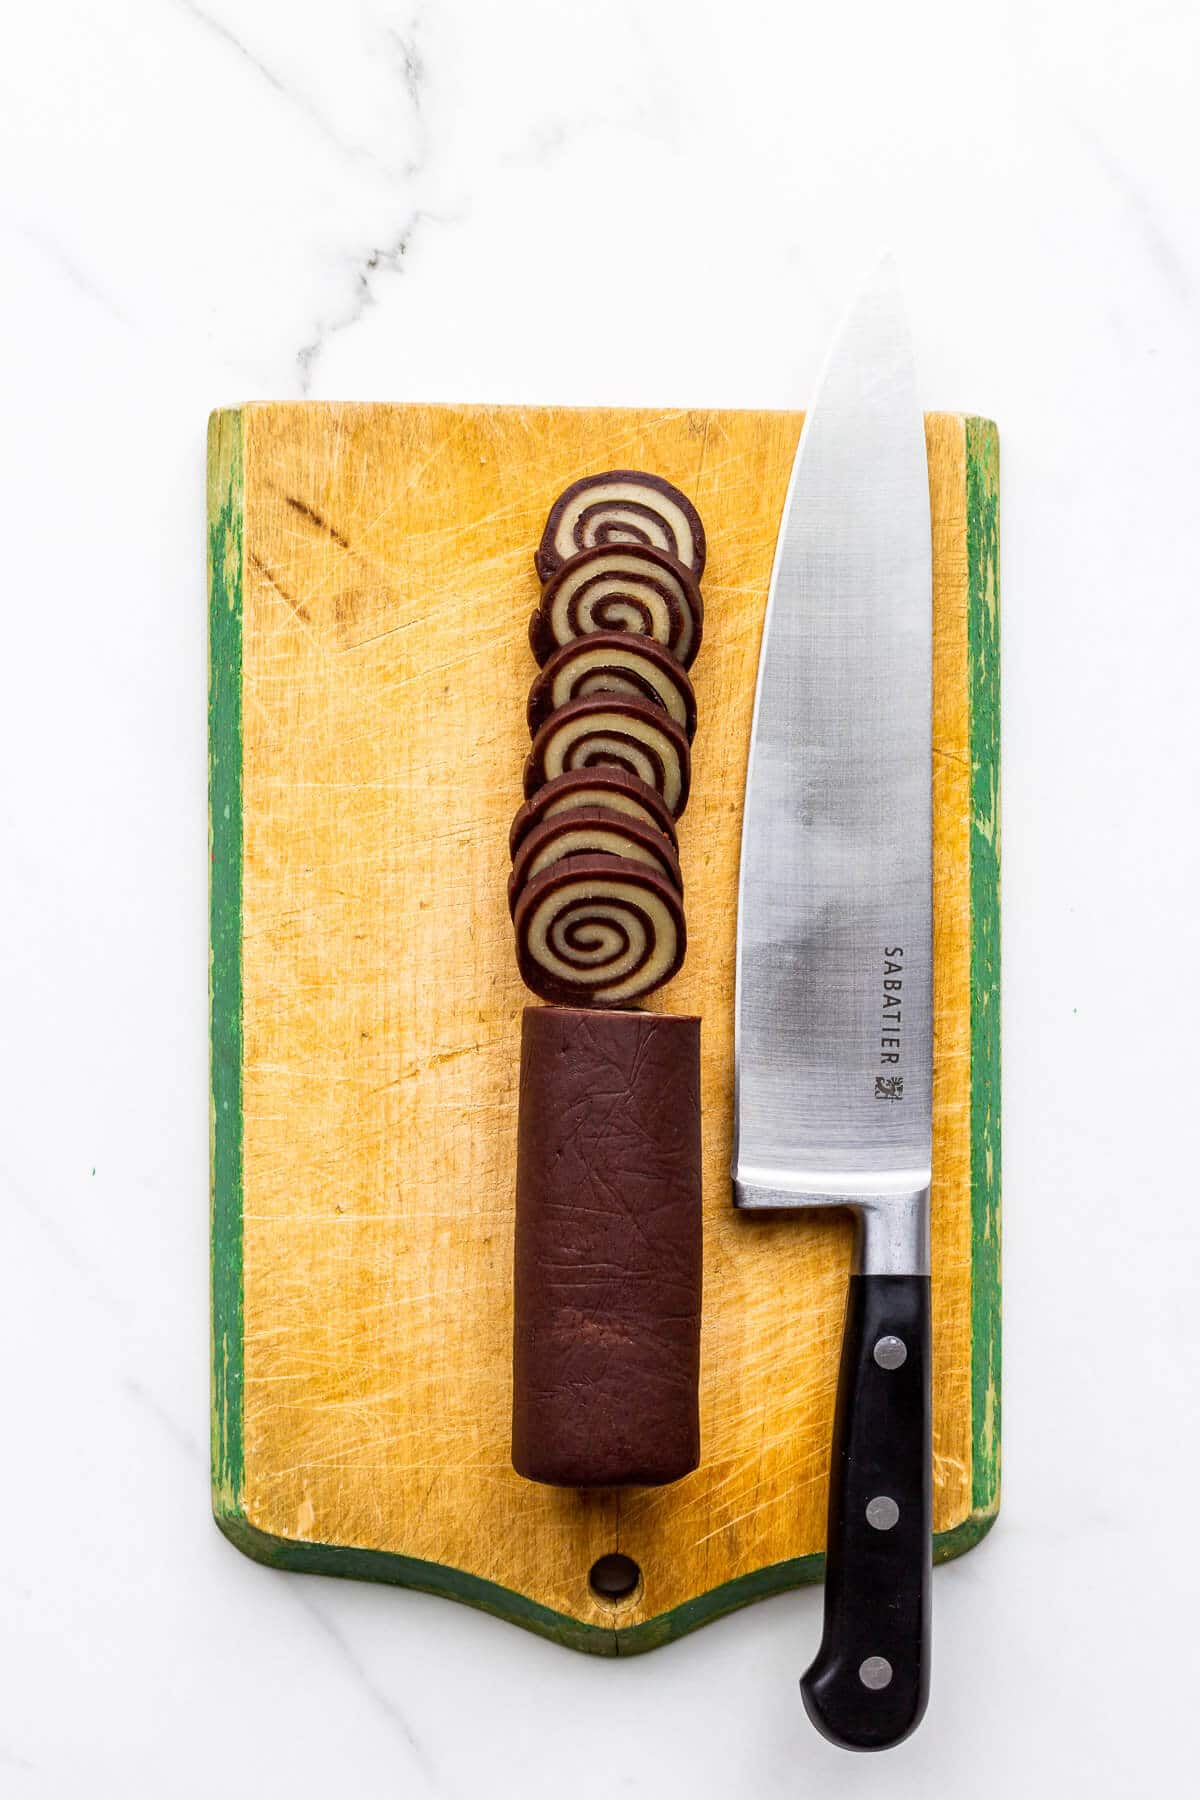 Slicing a log of cookie dough to make slice-and-bake pinwheel cookies.